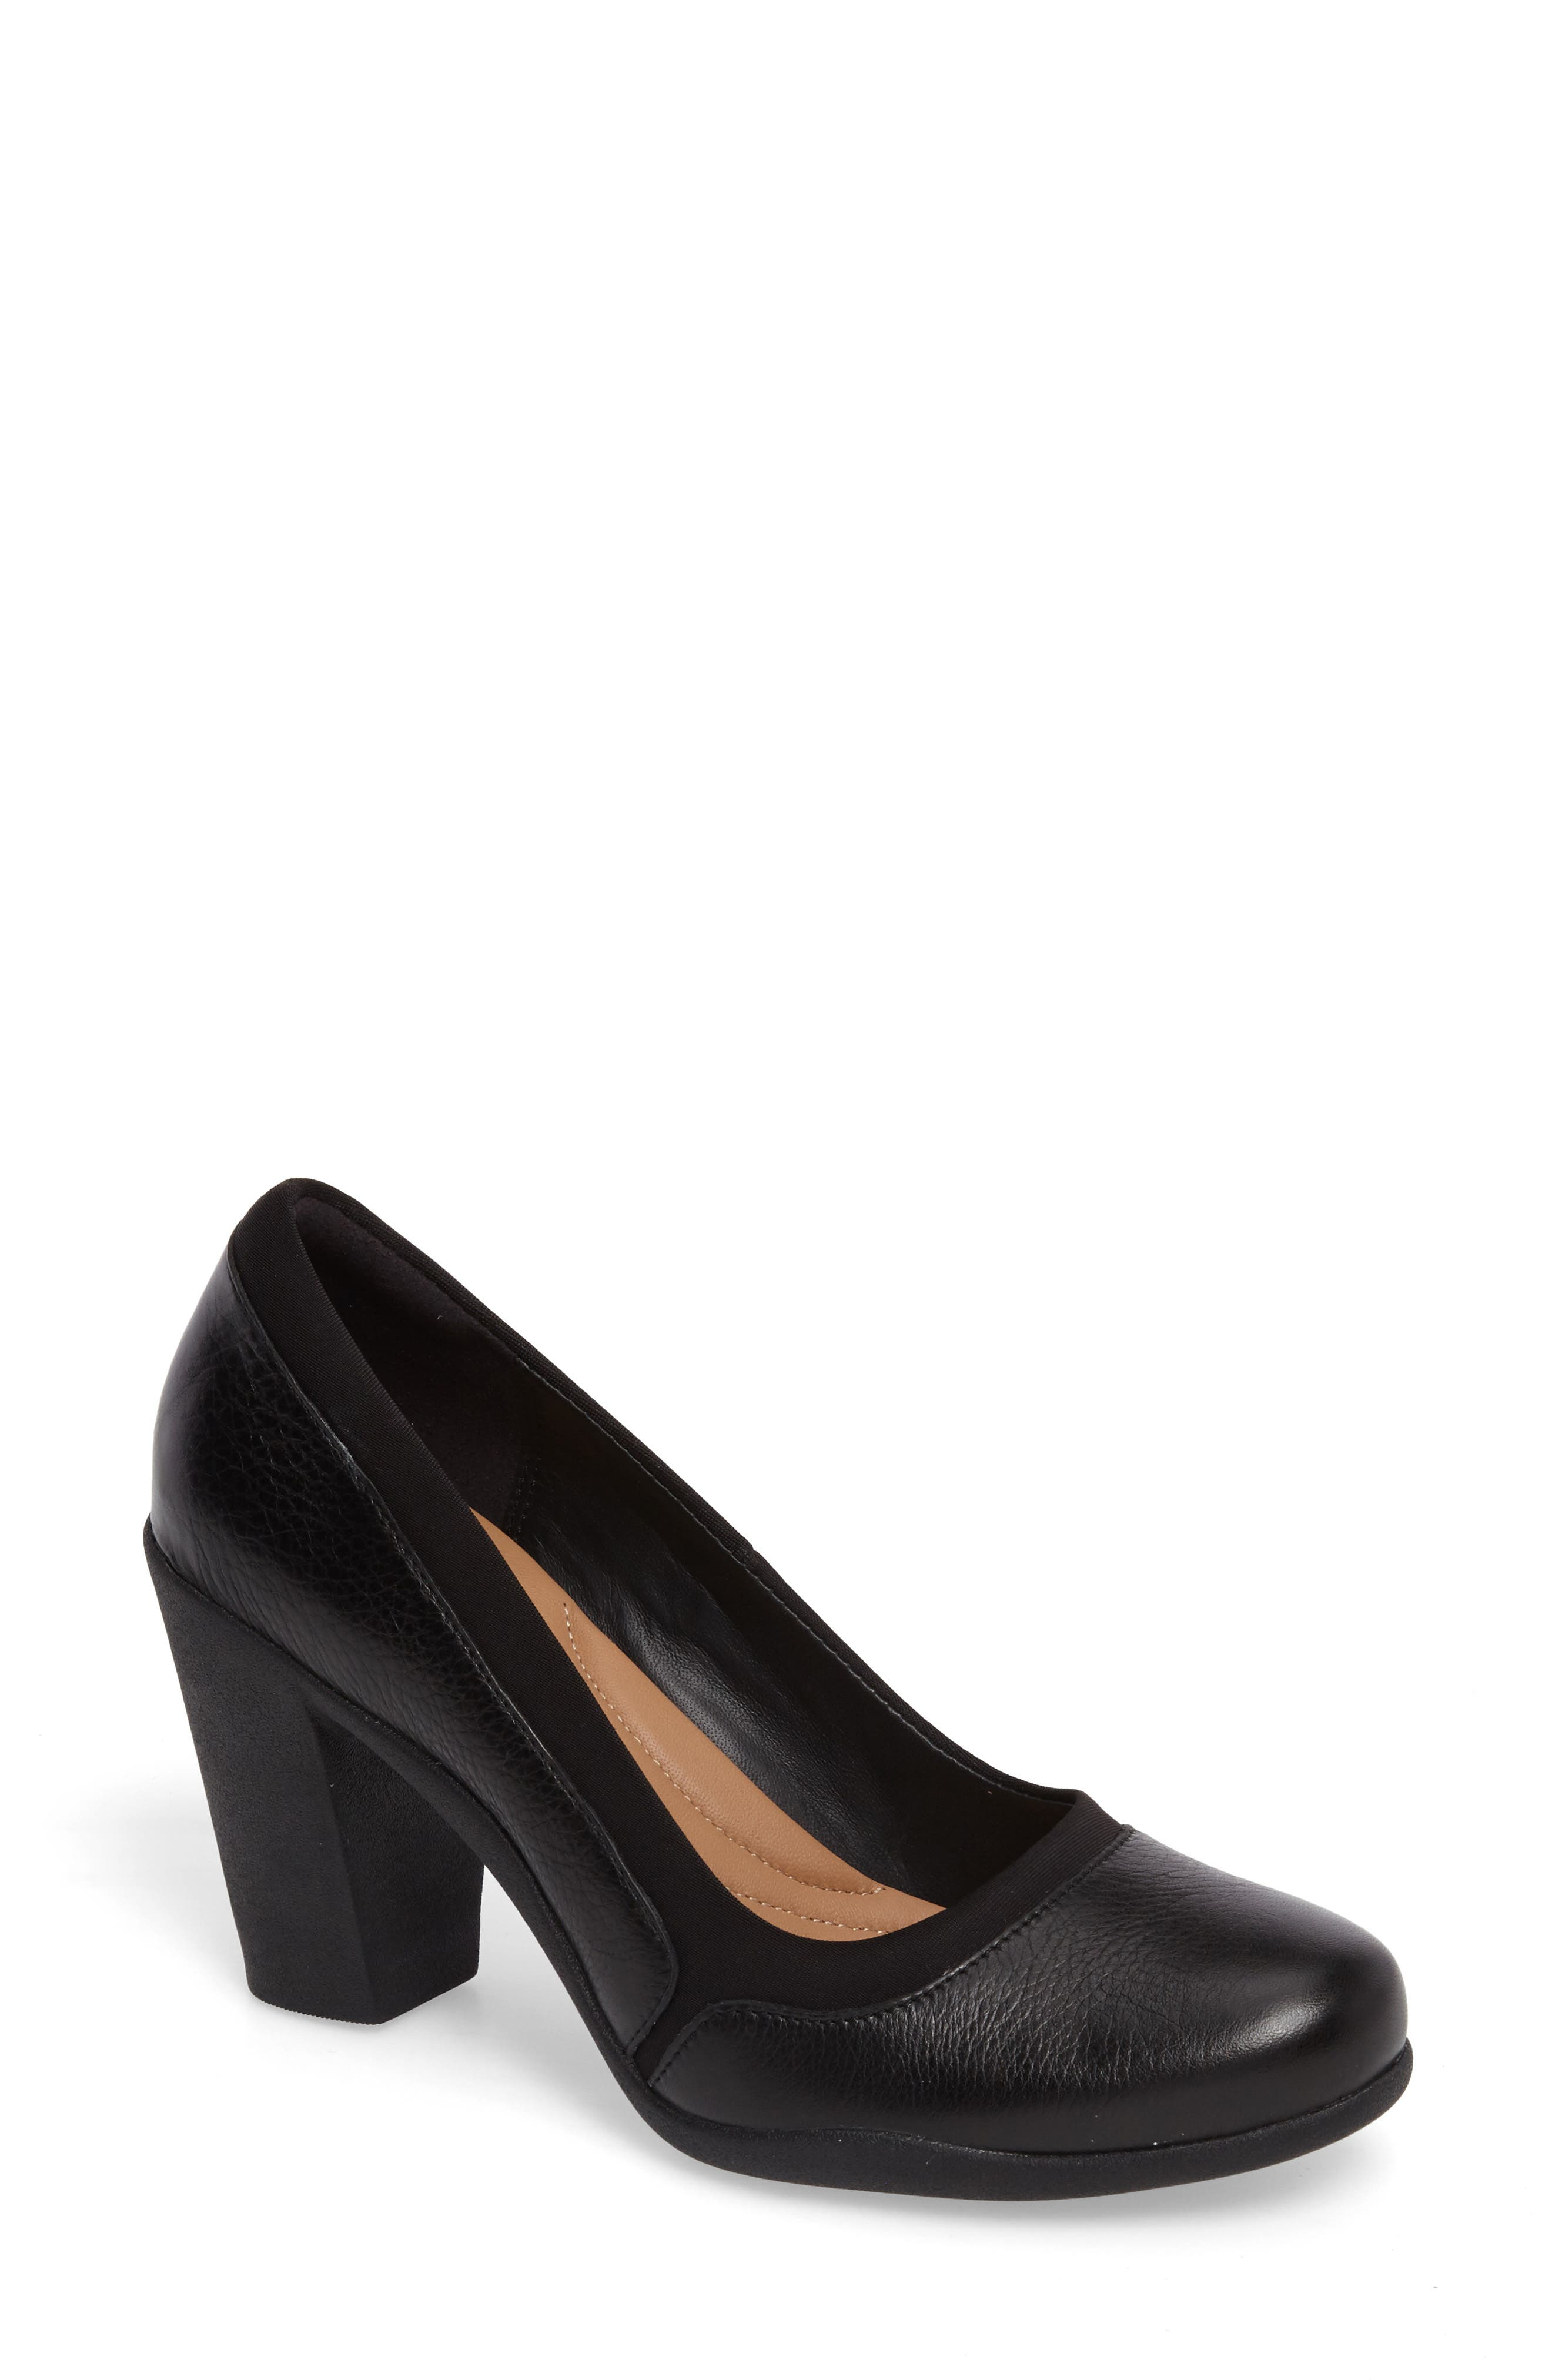 Ayda Maia Pump,                         Main,                         color, Black Leather